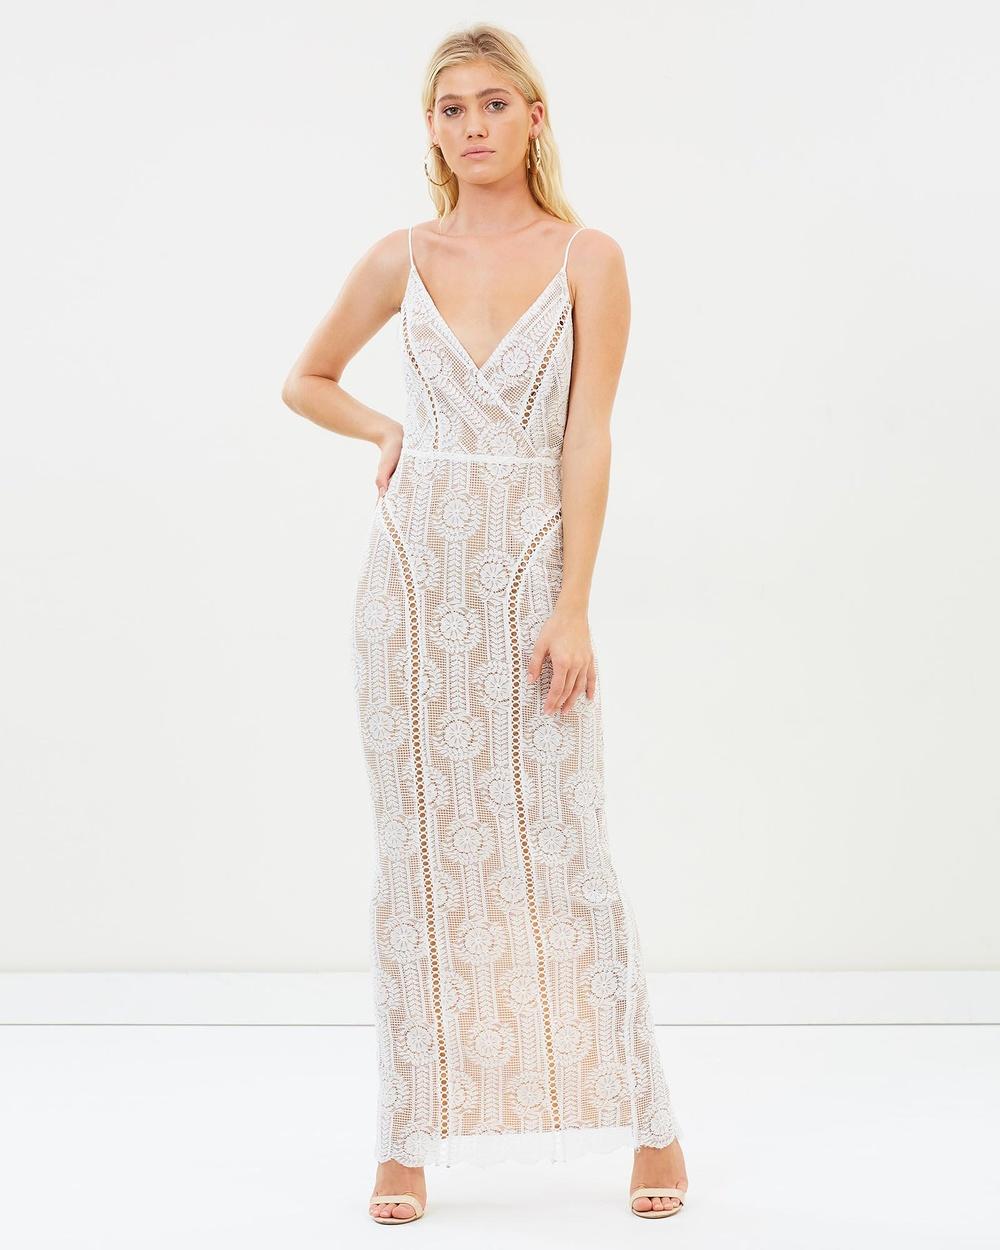 Winona Wisteria Maxi Dress Bridesmaid Dresses White Wisteria Maxi Dress